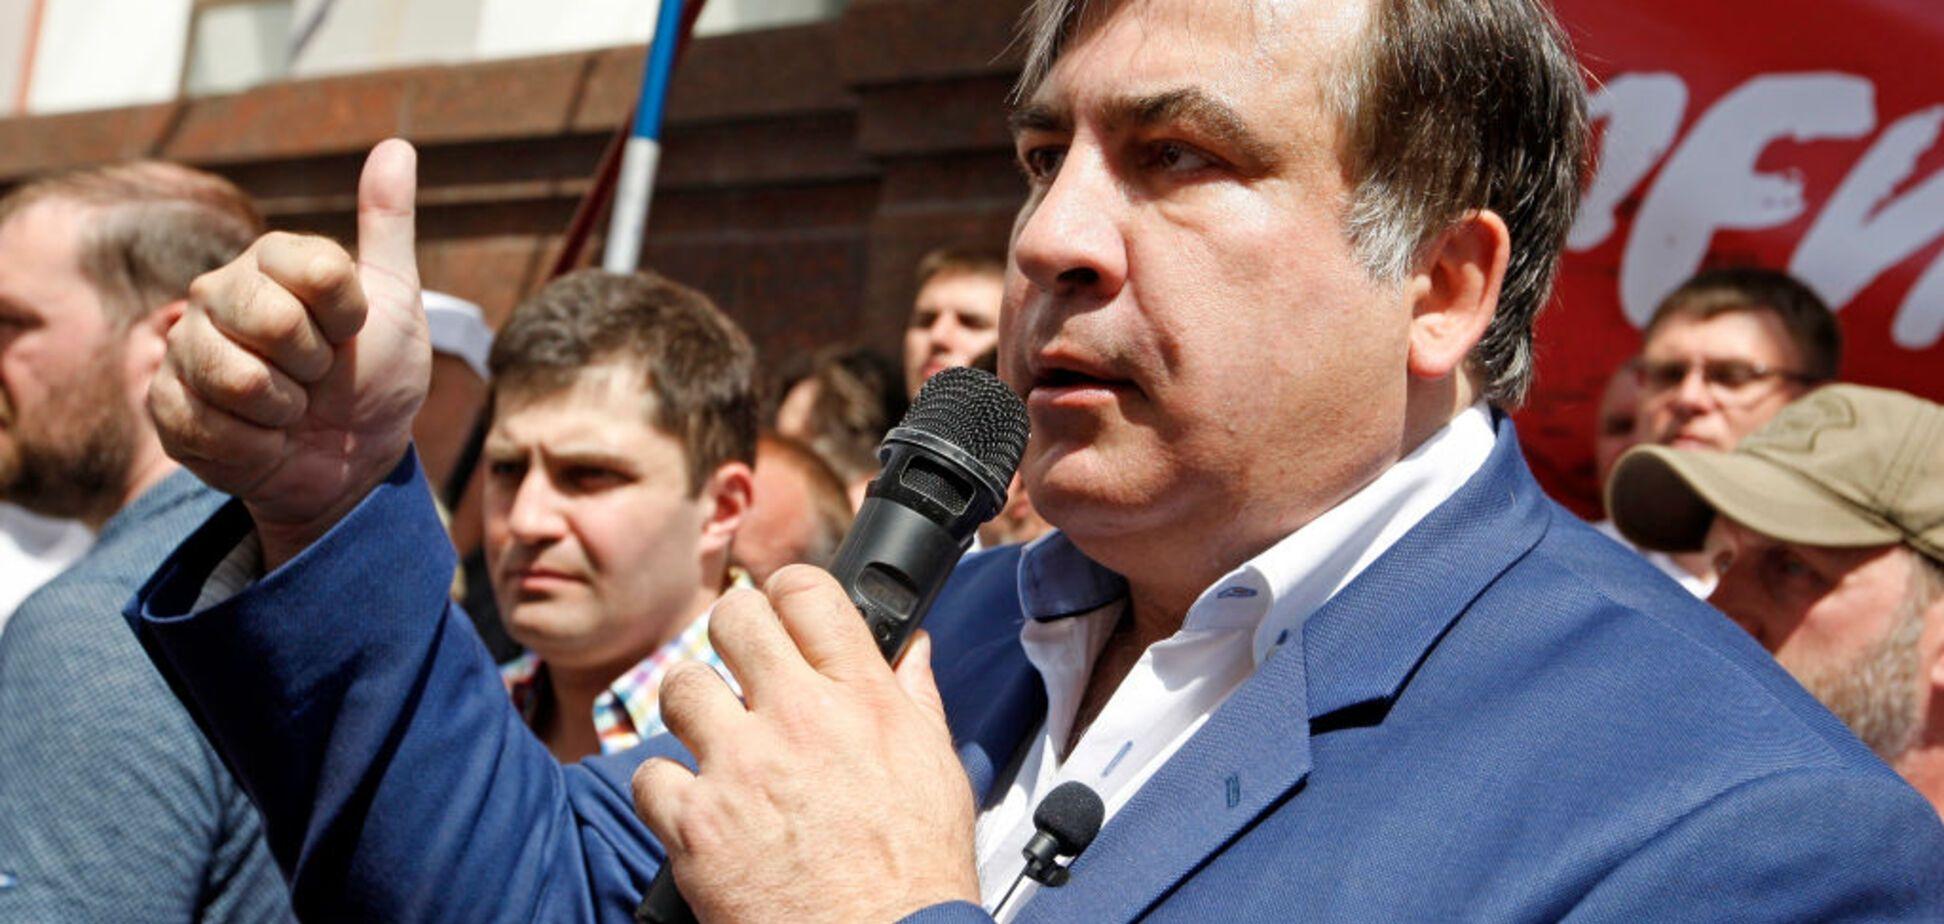 Потрібен суд: Литва раптово заступилася за Саакашвілі